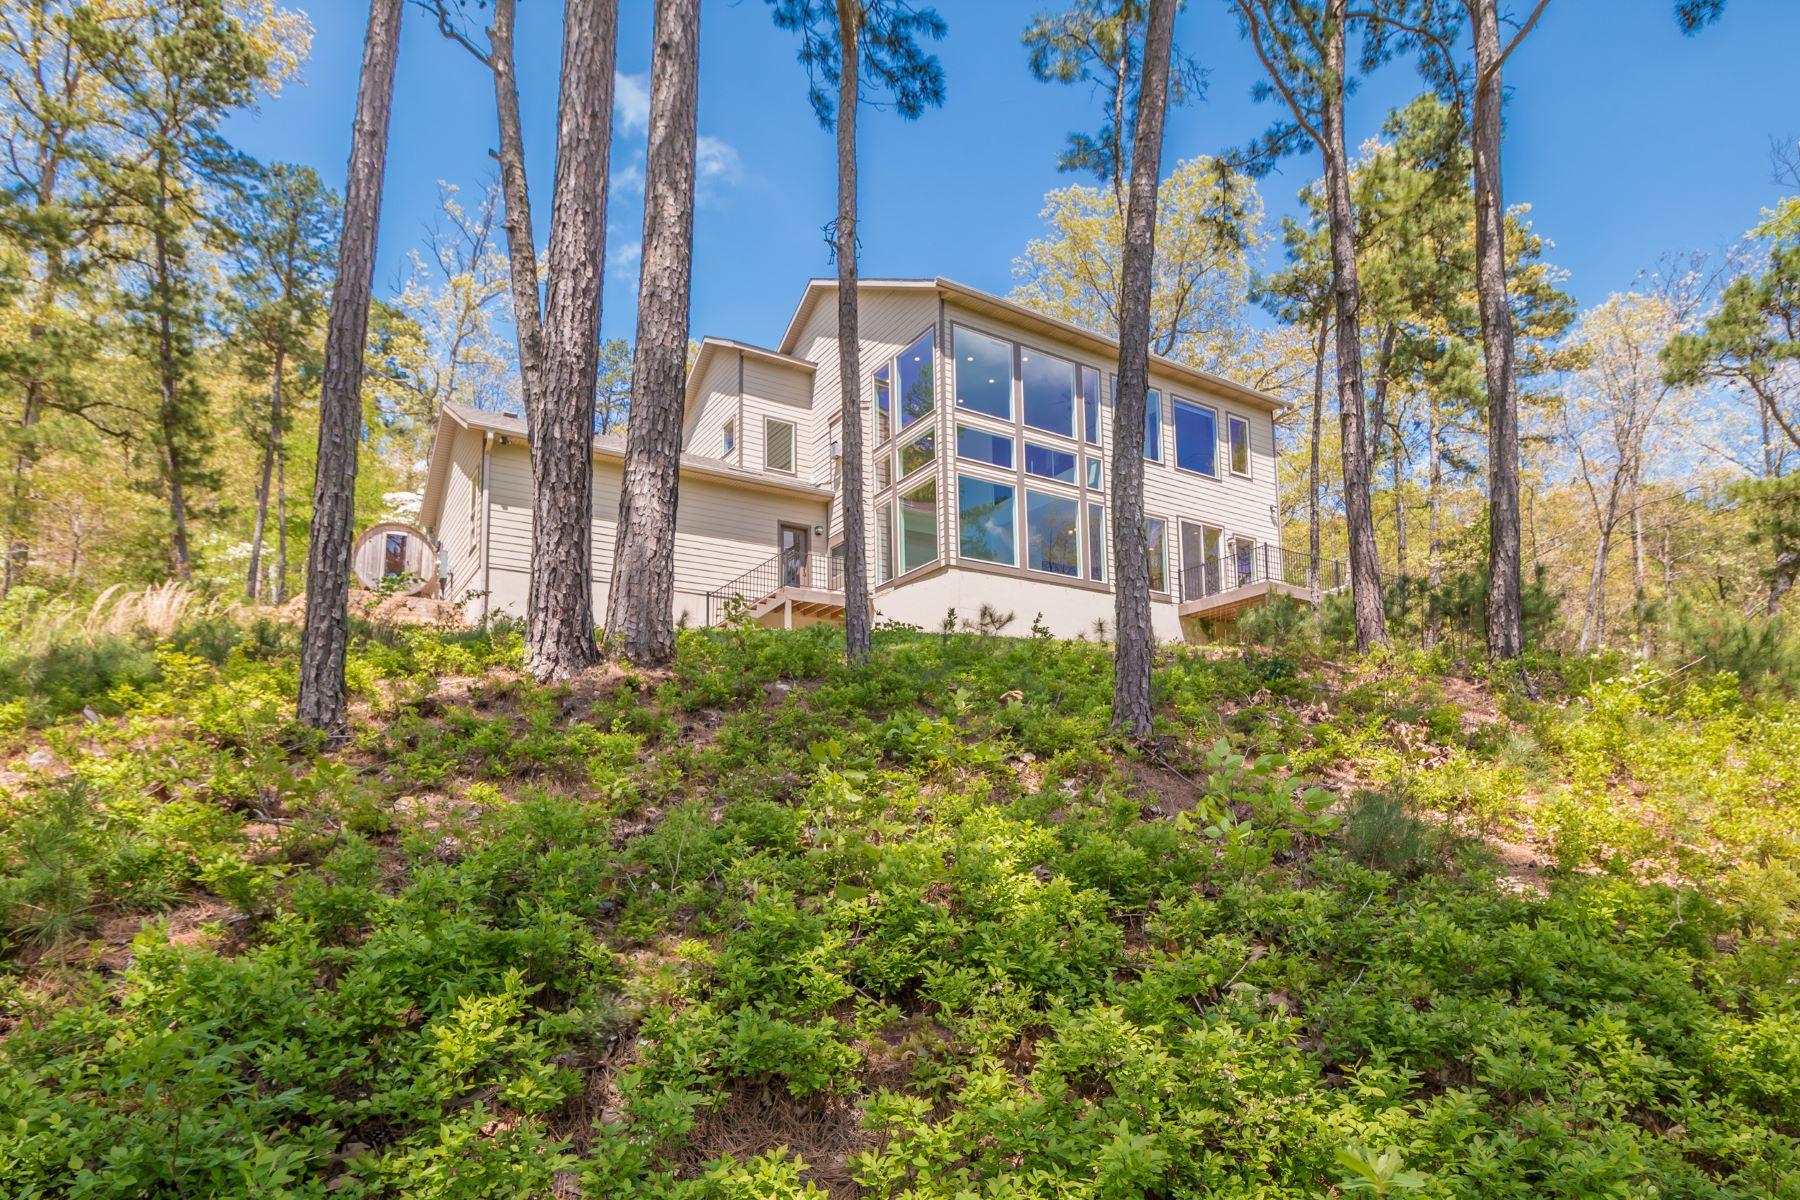 Single Family Homes για την Πώληση στο Bella Vista, Αρκανσασ 72714 Ηνωμένες Πολιτείες